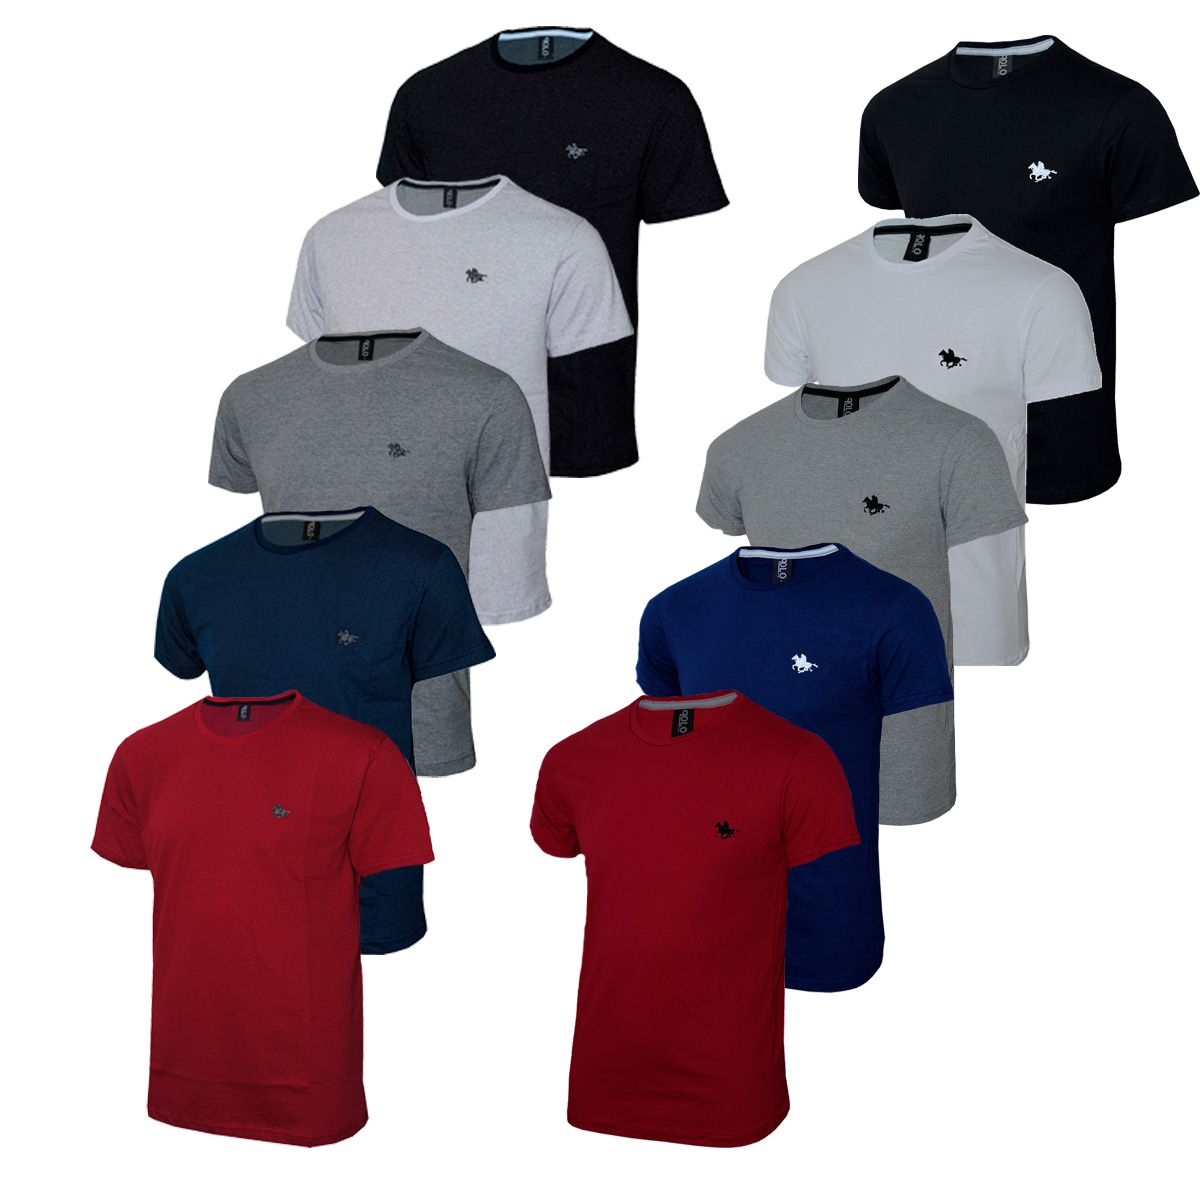 Kit 10 Camiseta Masculina Básica  Polo RG518